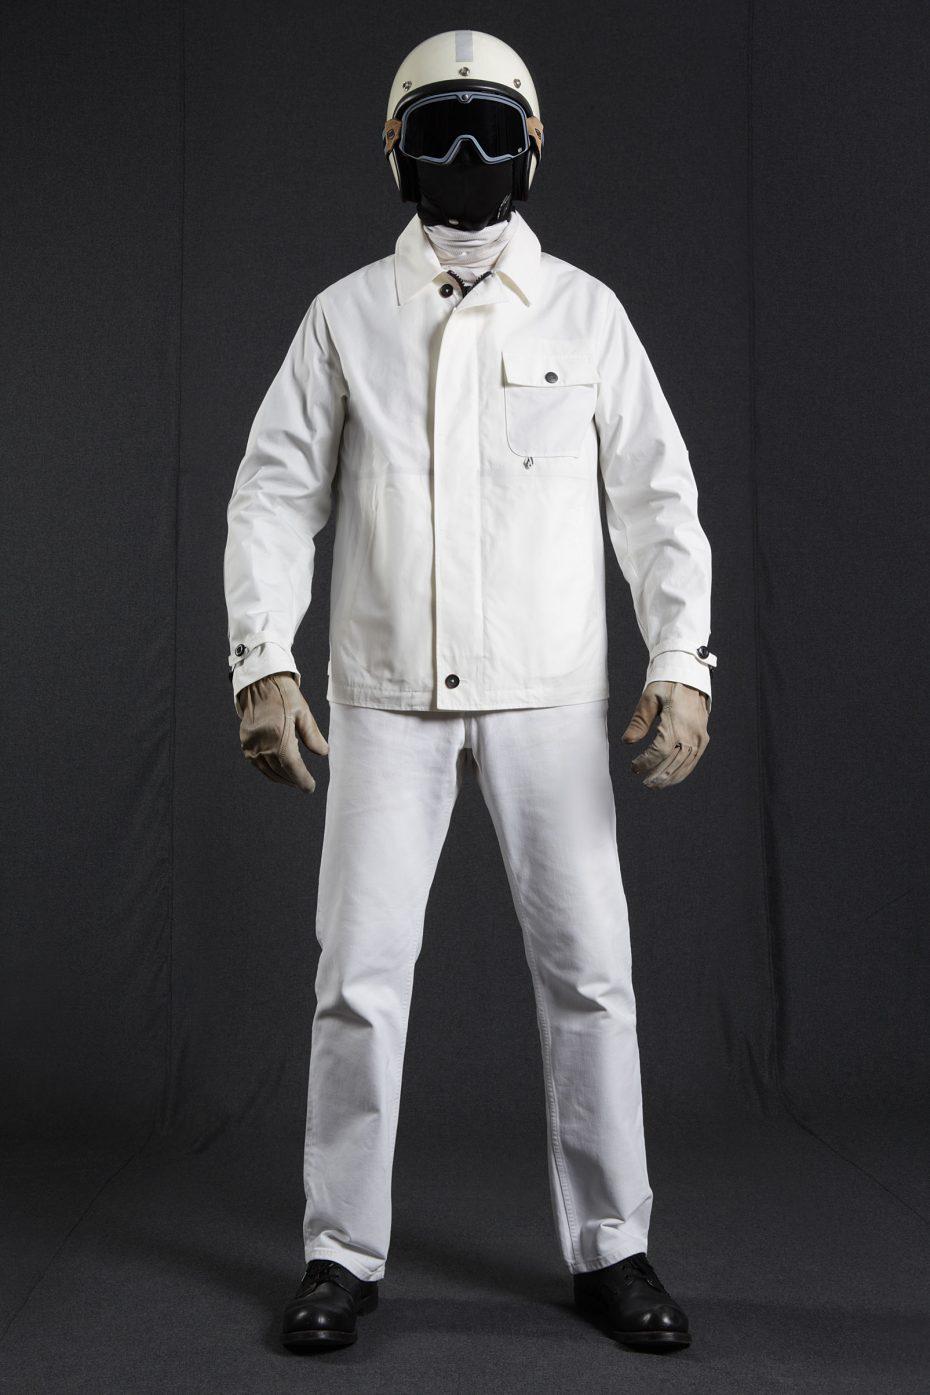 BiondoEndurance_HeavyDuty_GB_0006_Jacket-Short_White_Portrait_Front